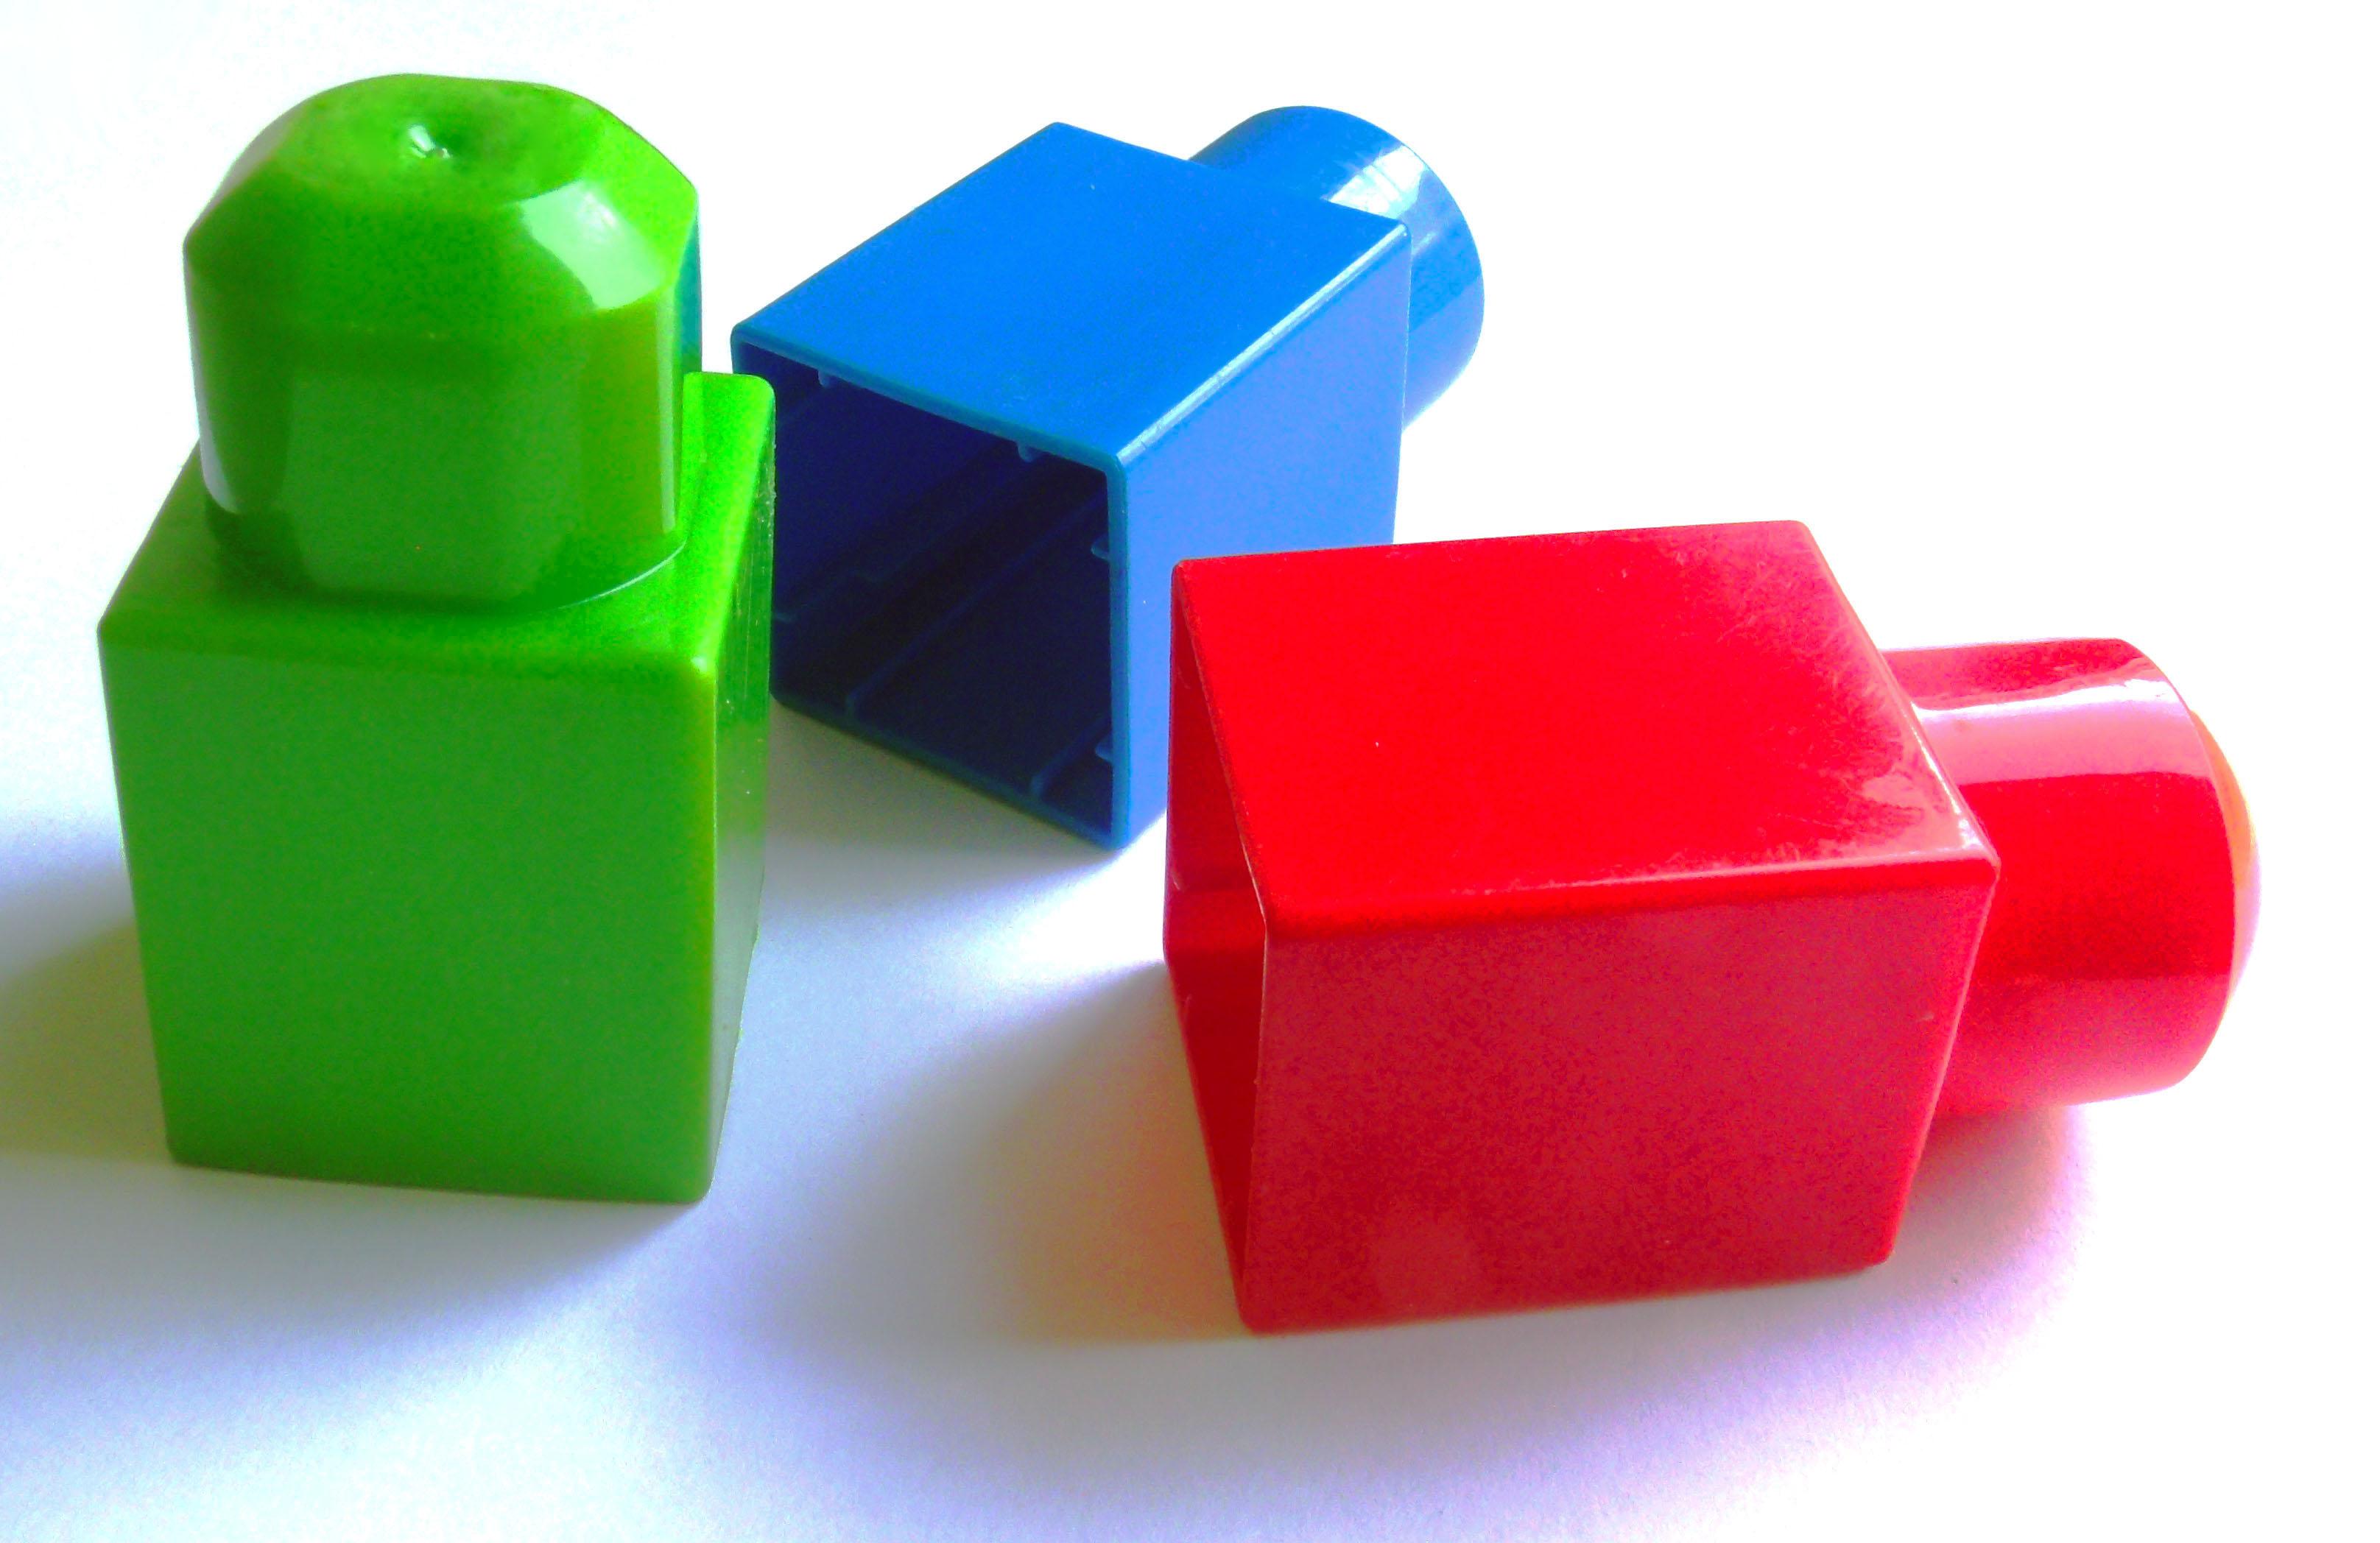 Kids Toy Blocks, Bright, Childrens, Color, Kids, HQ Photo